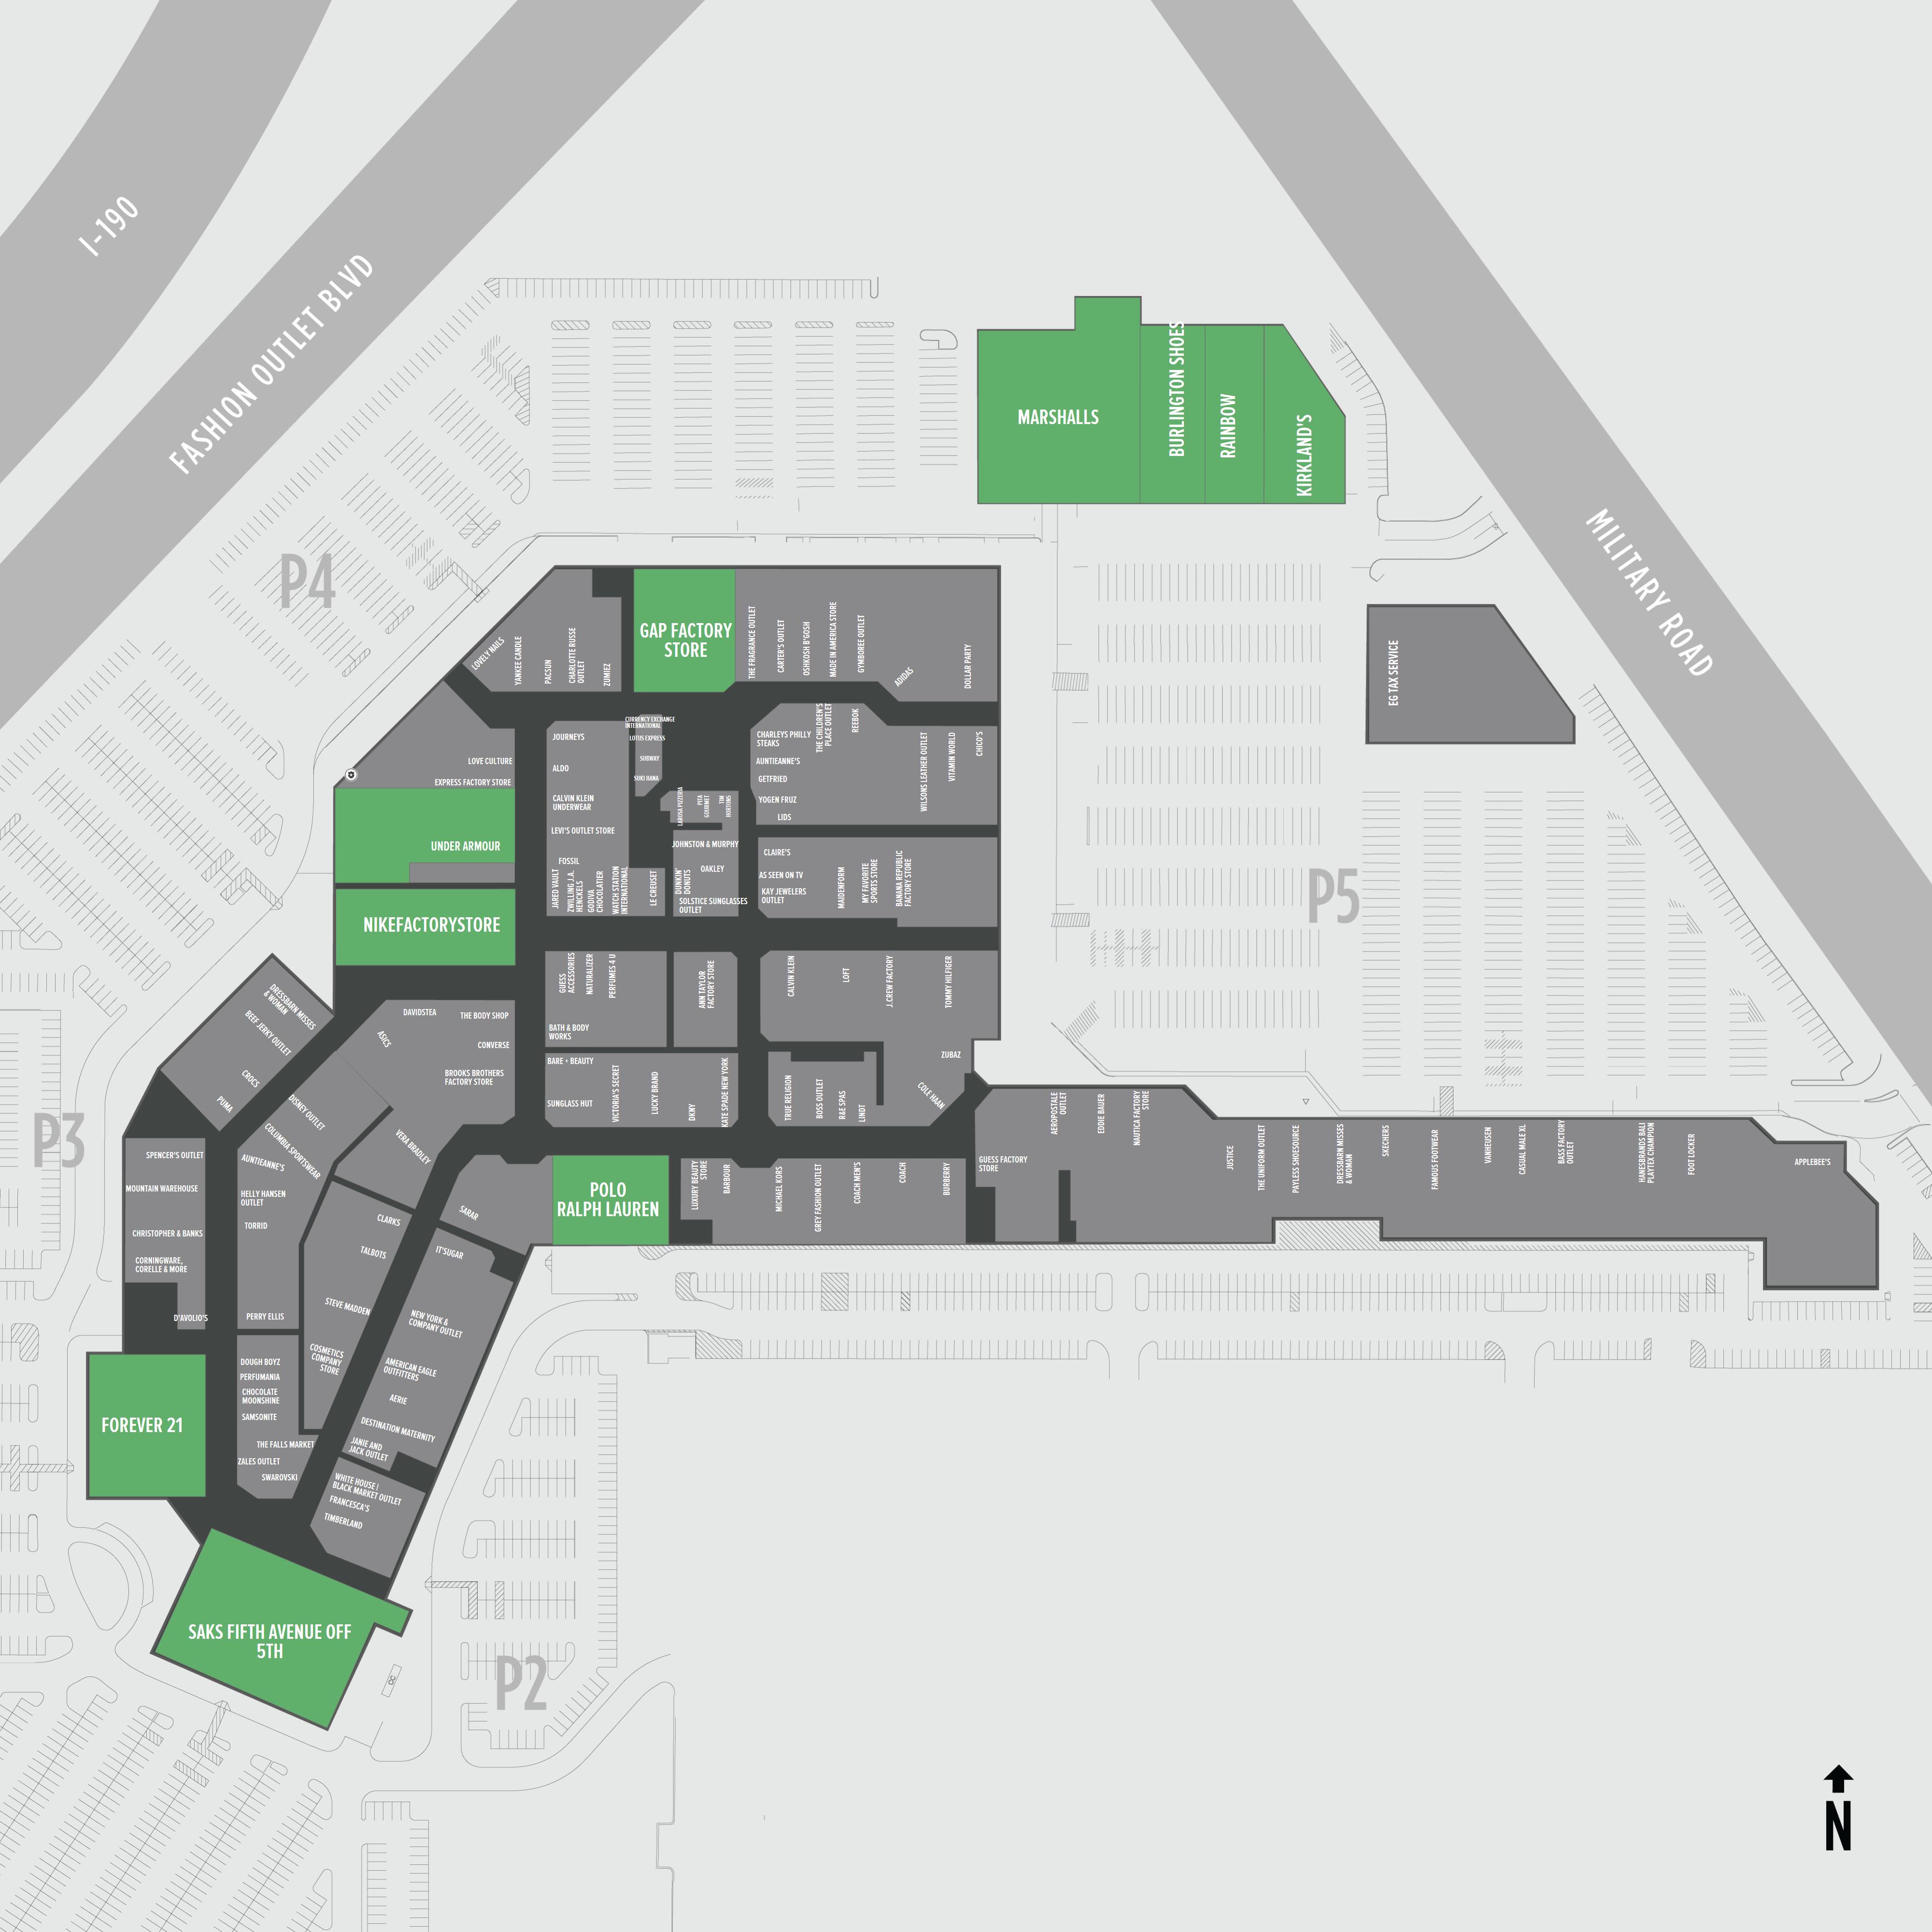 niagara falls outlet mall map Mall Map Of Prime Outlets Niagara Falls Ny Sinalizacao Shopping niagara falls outlet mall map